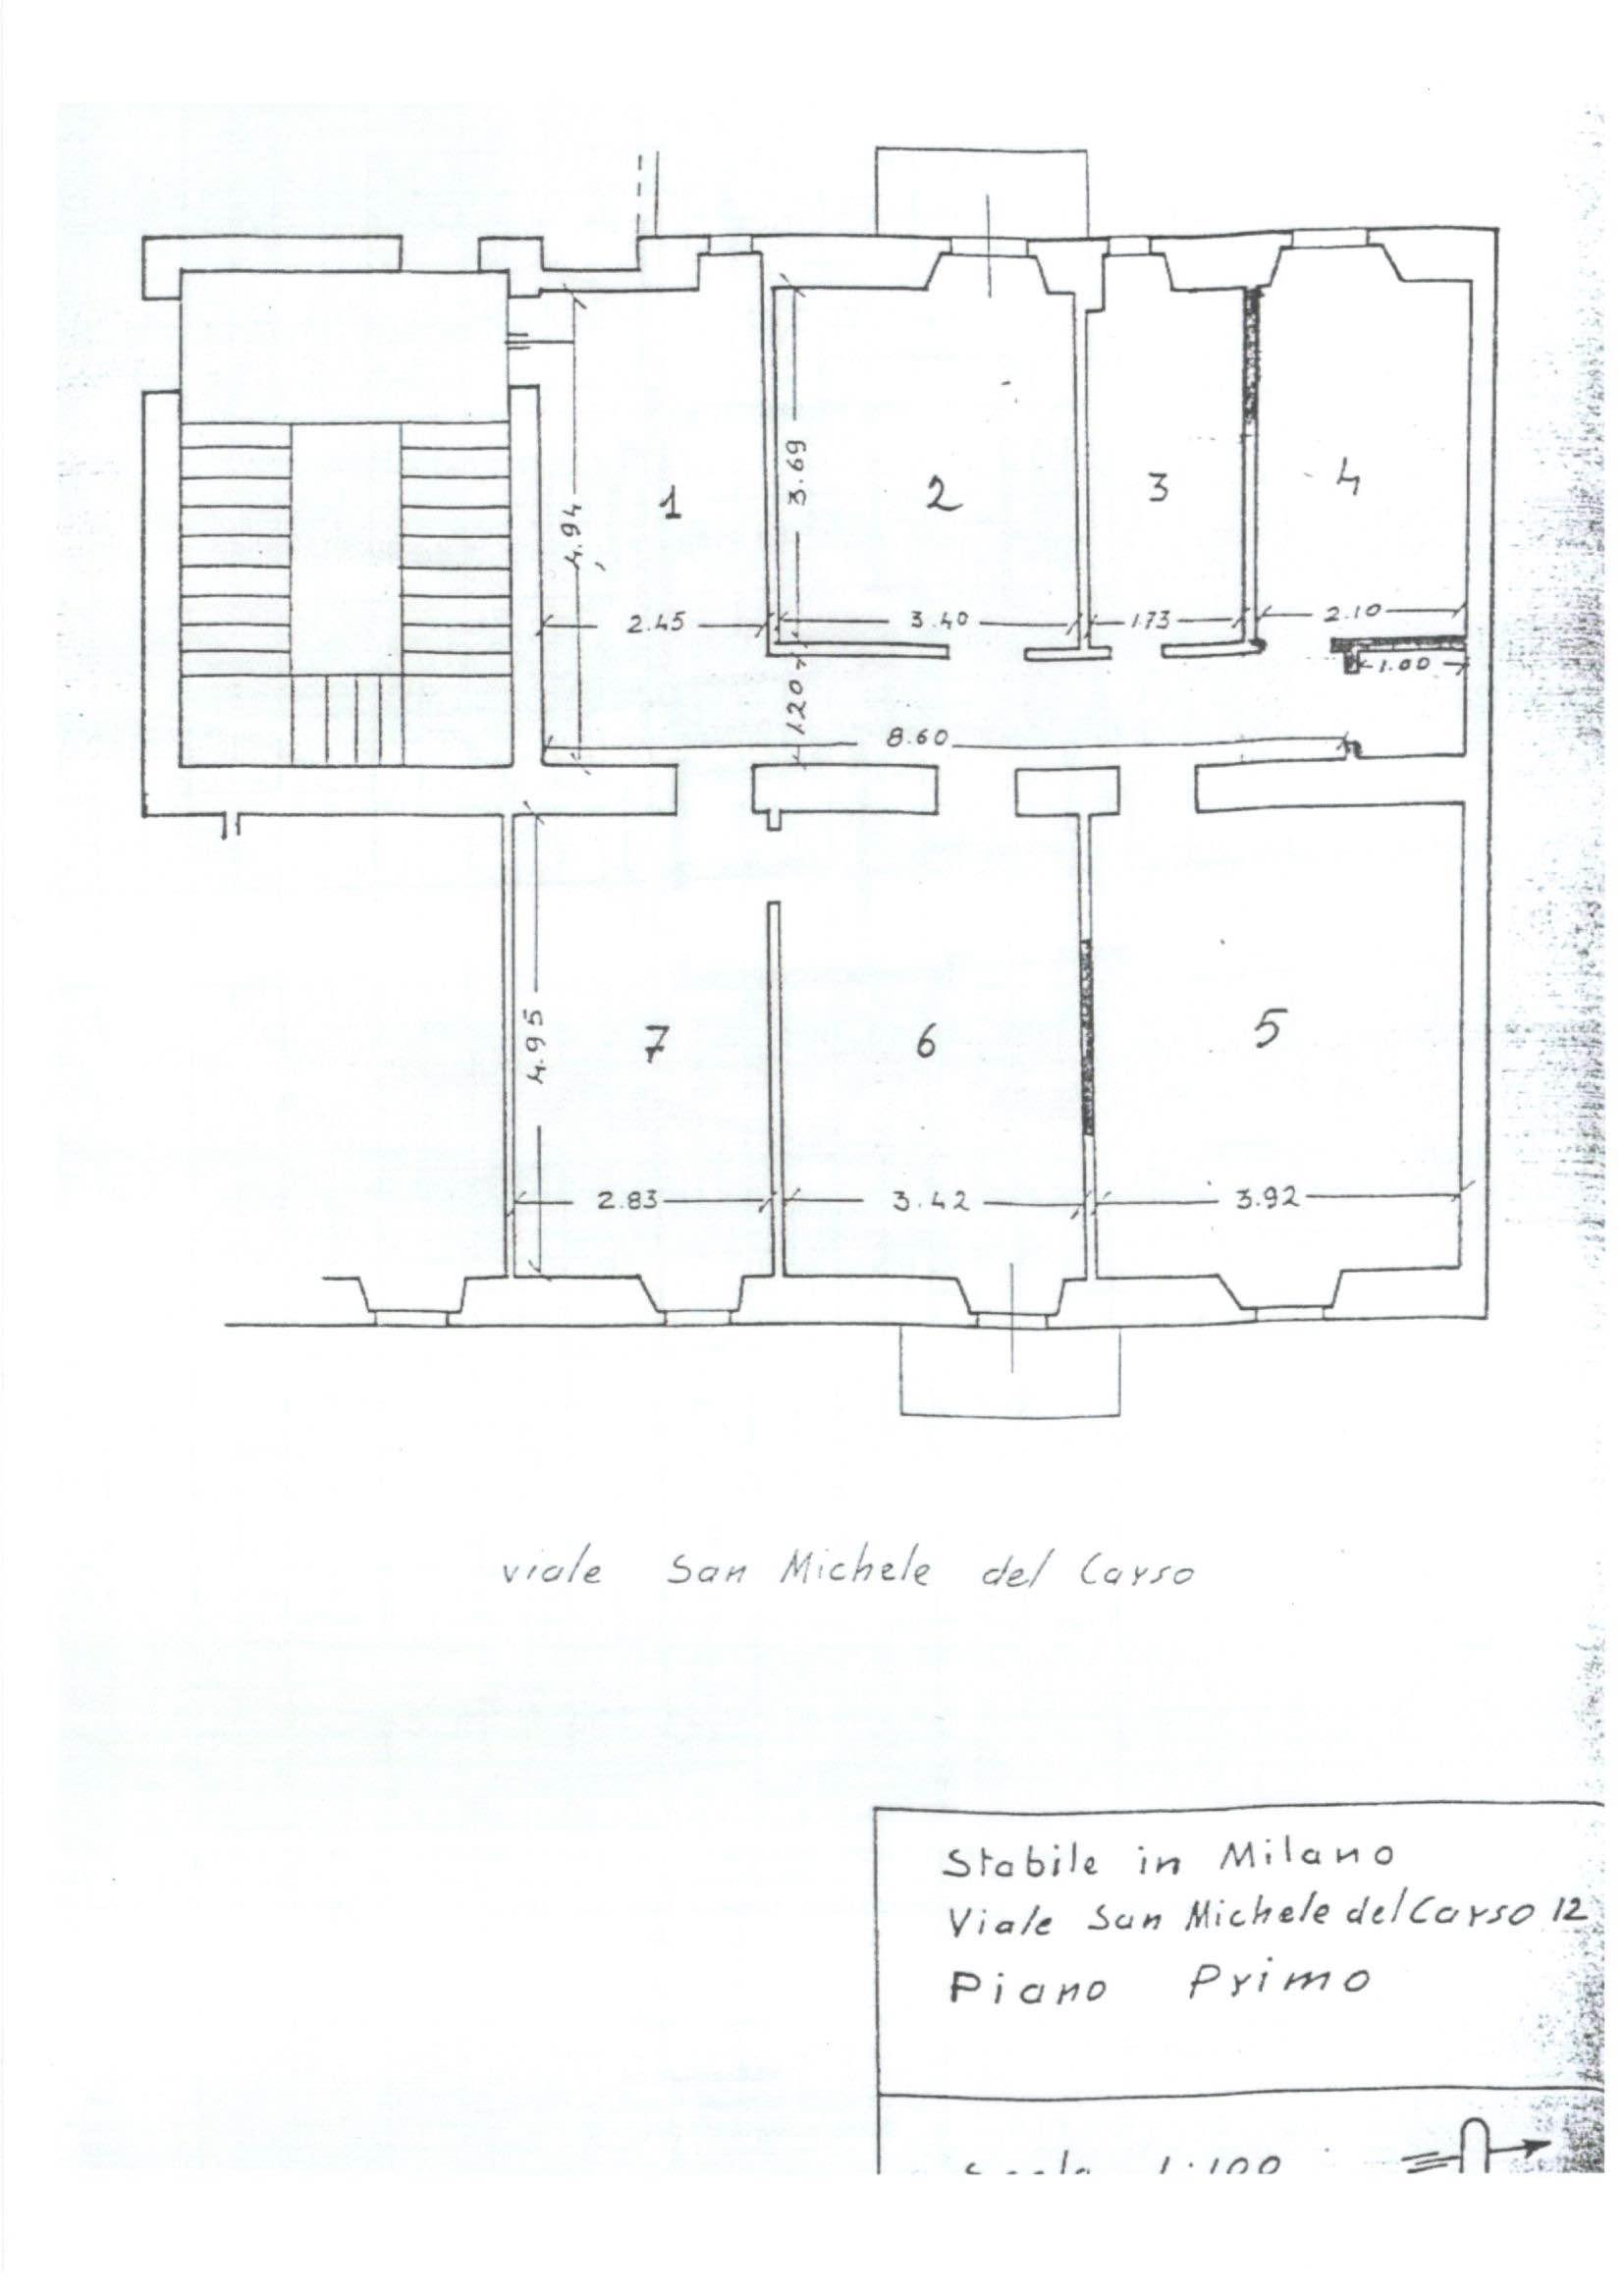 planimetrie/NV6i4O761x.jpg